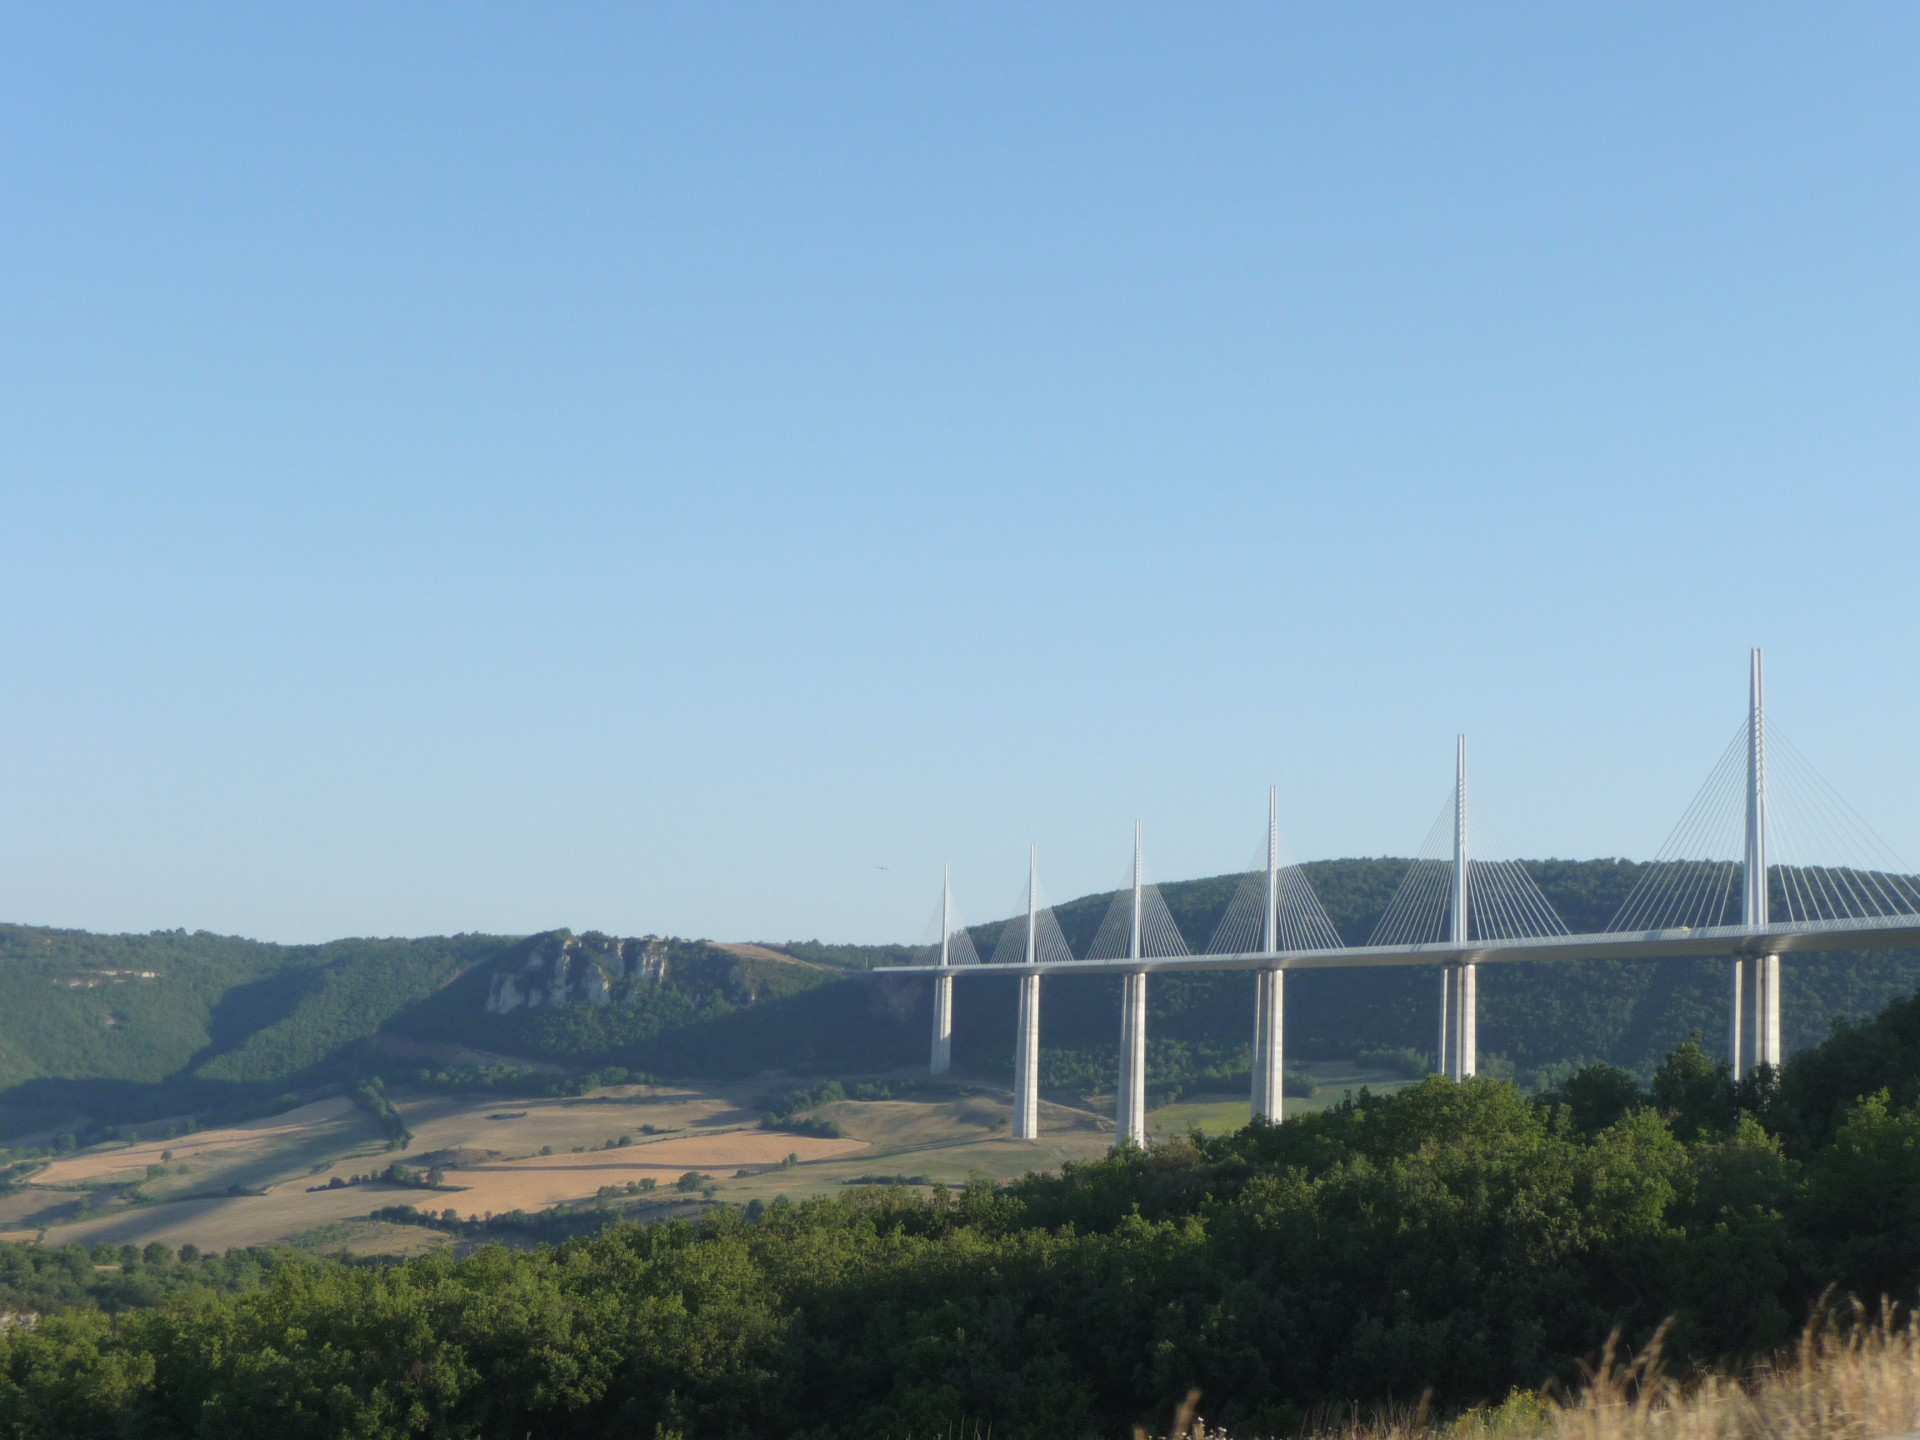 Viaduc de Millau, vom Rastplatz Aire de Brocuéjouls aus gesehen